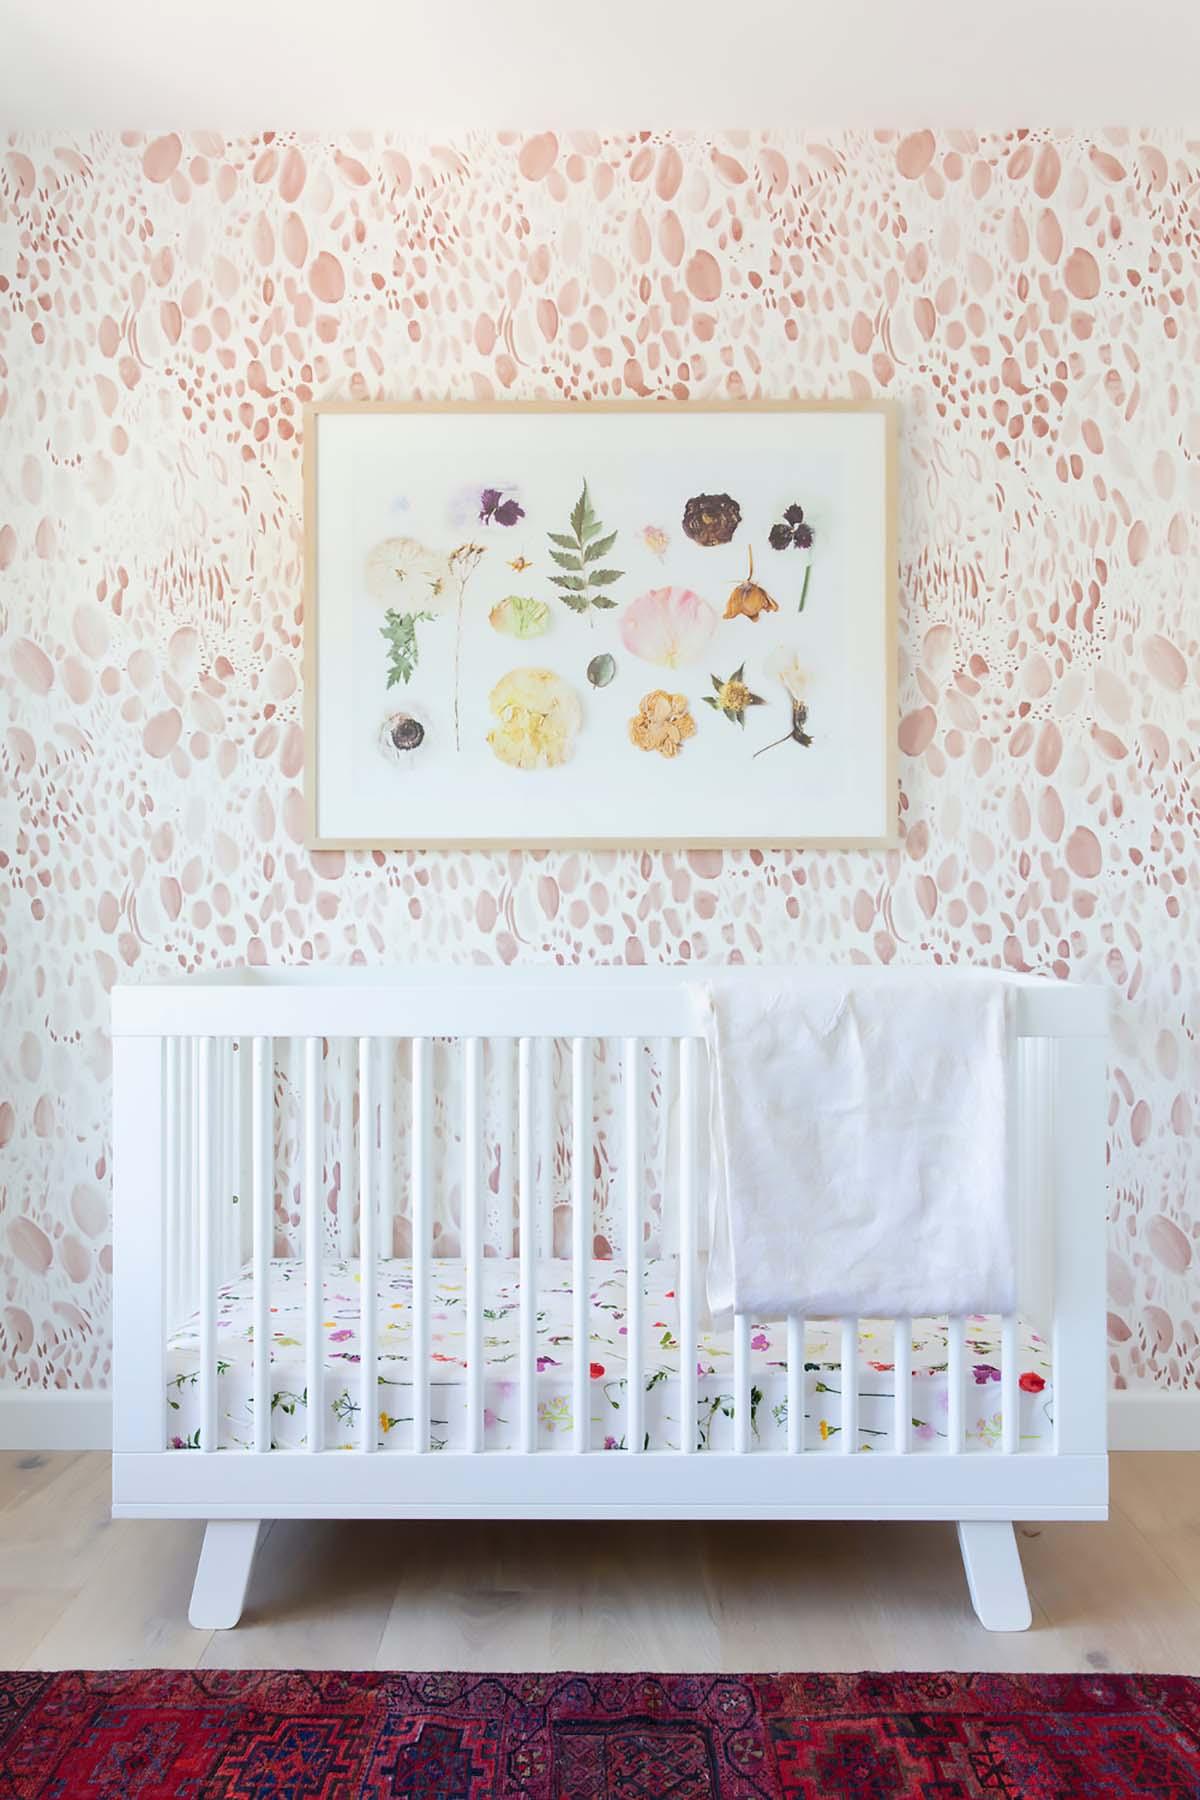 pressed flower art above crib in baby nursery